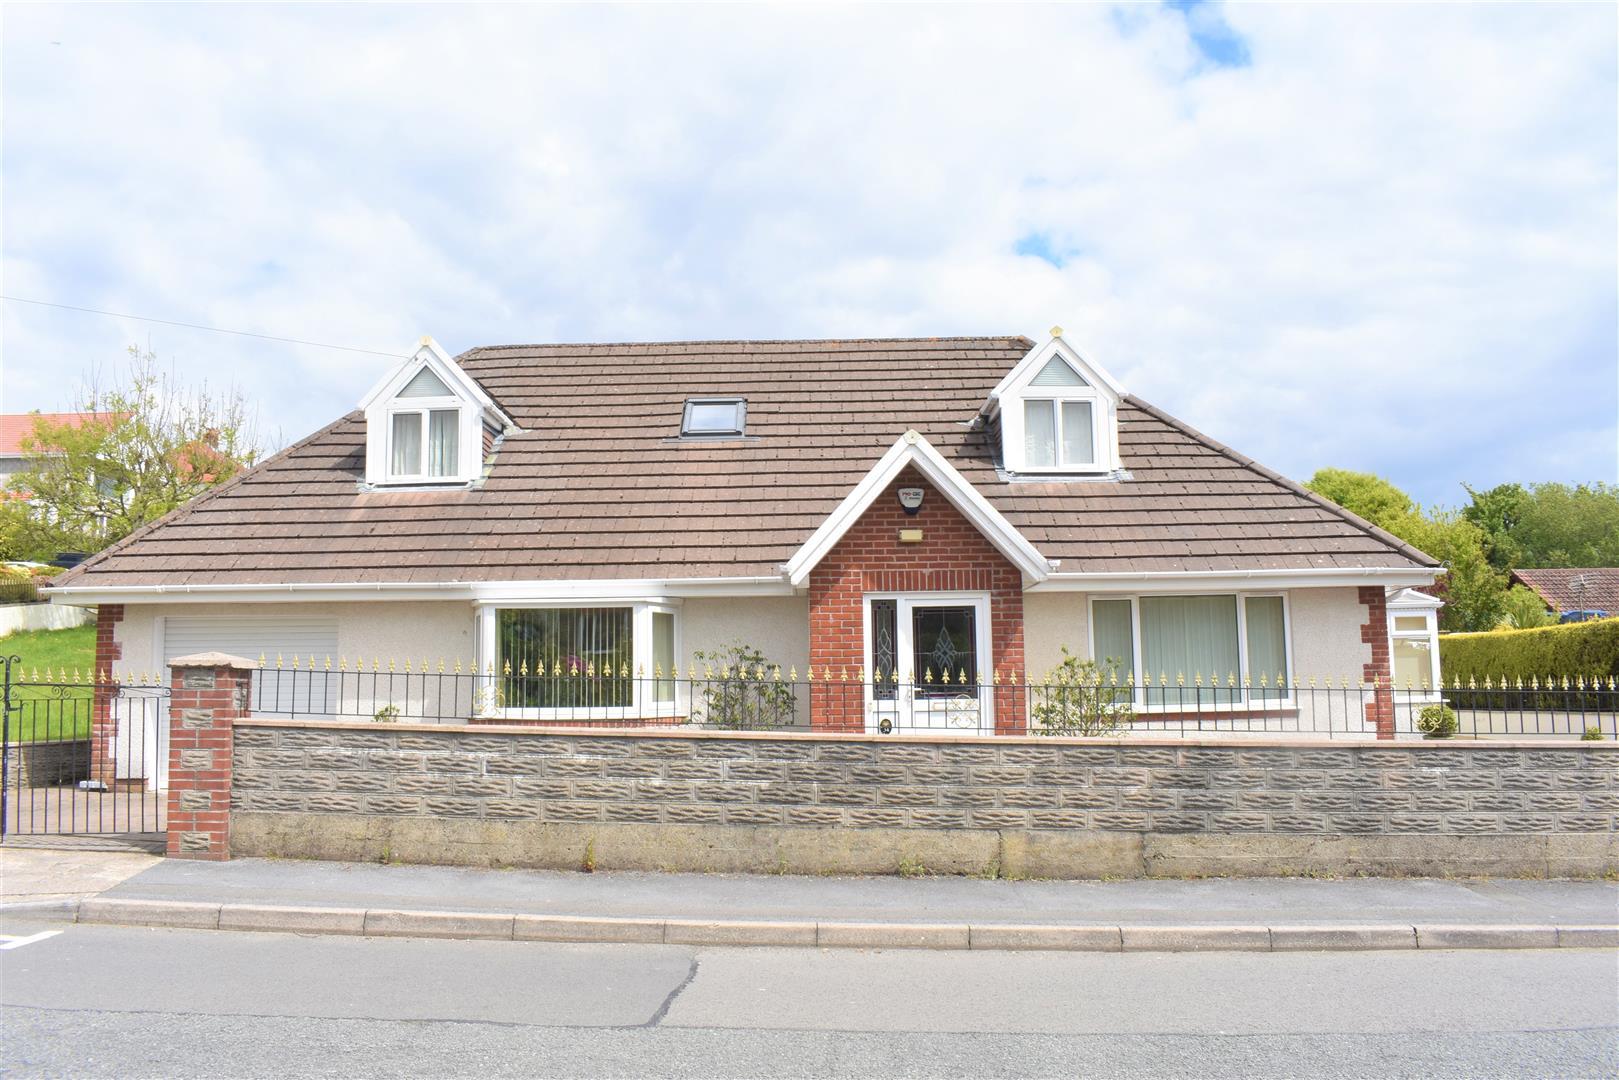 Glan Yr Afon Road, Sketty, Swansea, SA2 9JA